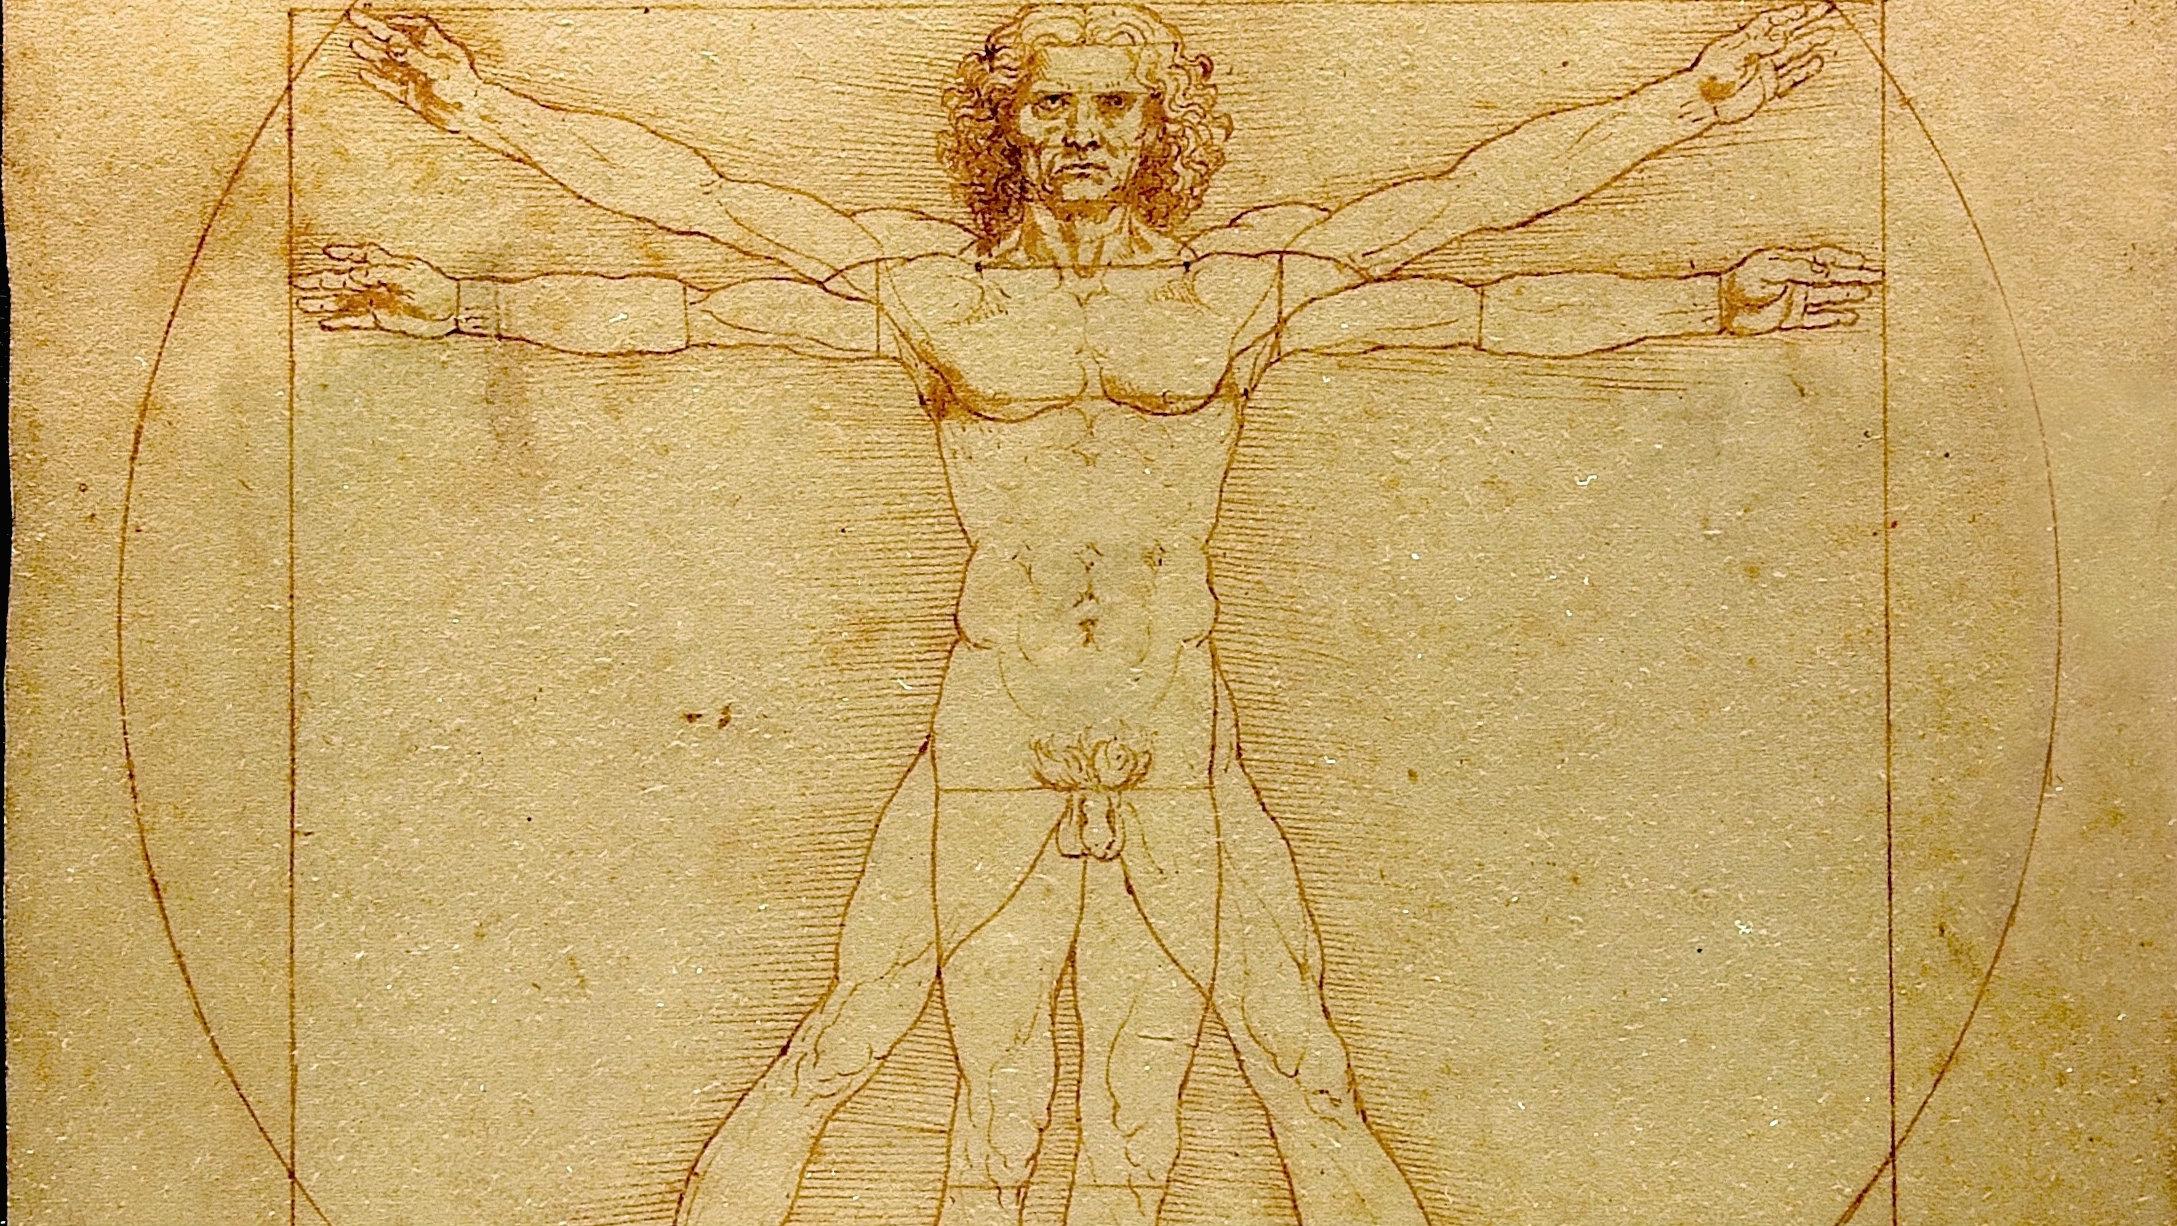 Leonardo da Vinci's Vitruvian Man.